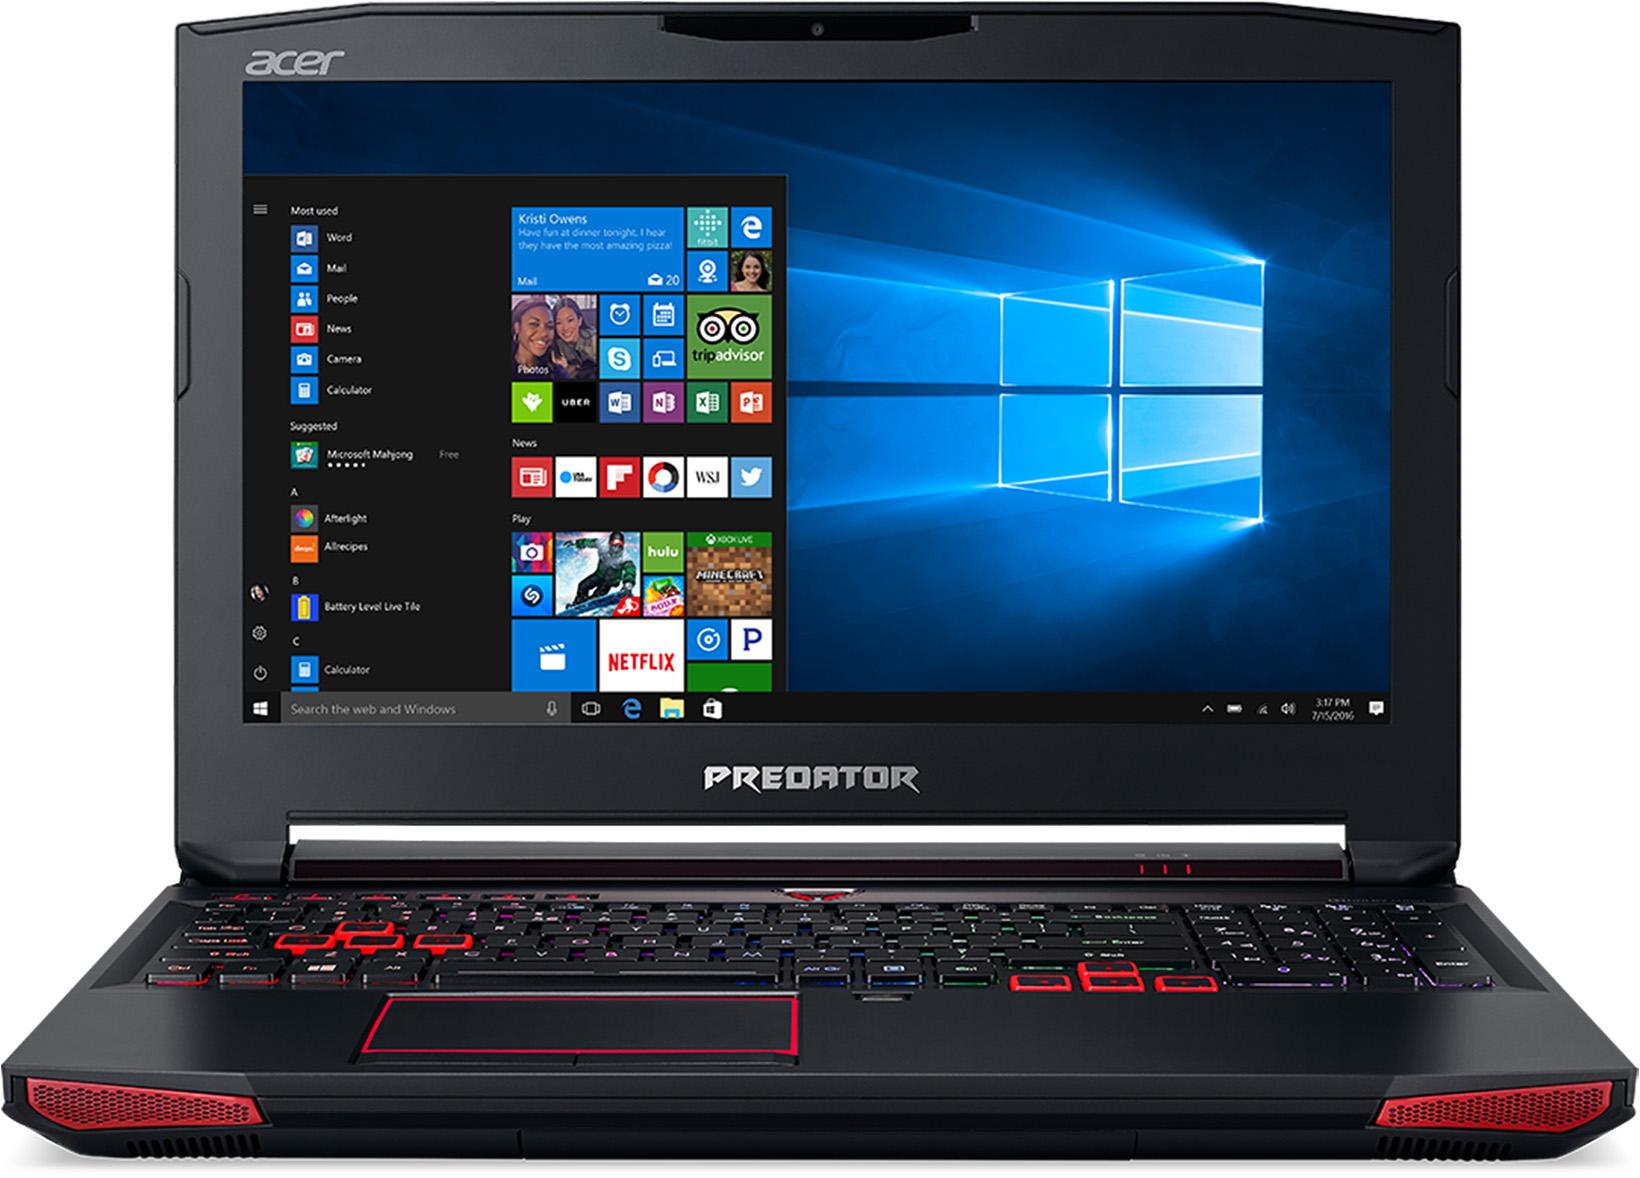 Acer Predator 15 G9-593-73FK Signature Edition Gaming Laptop